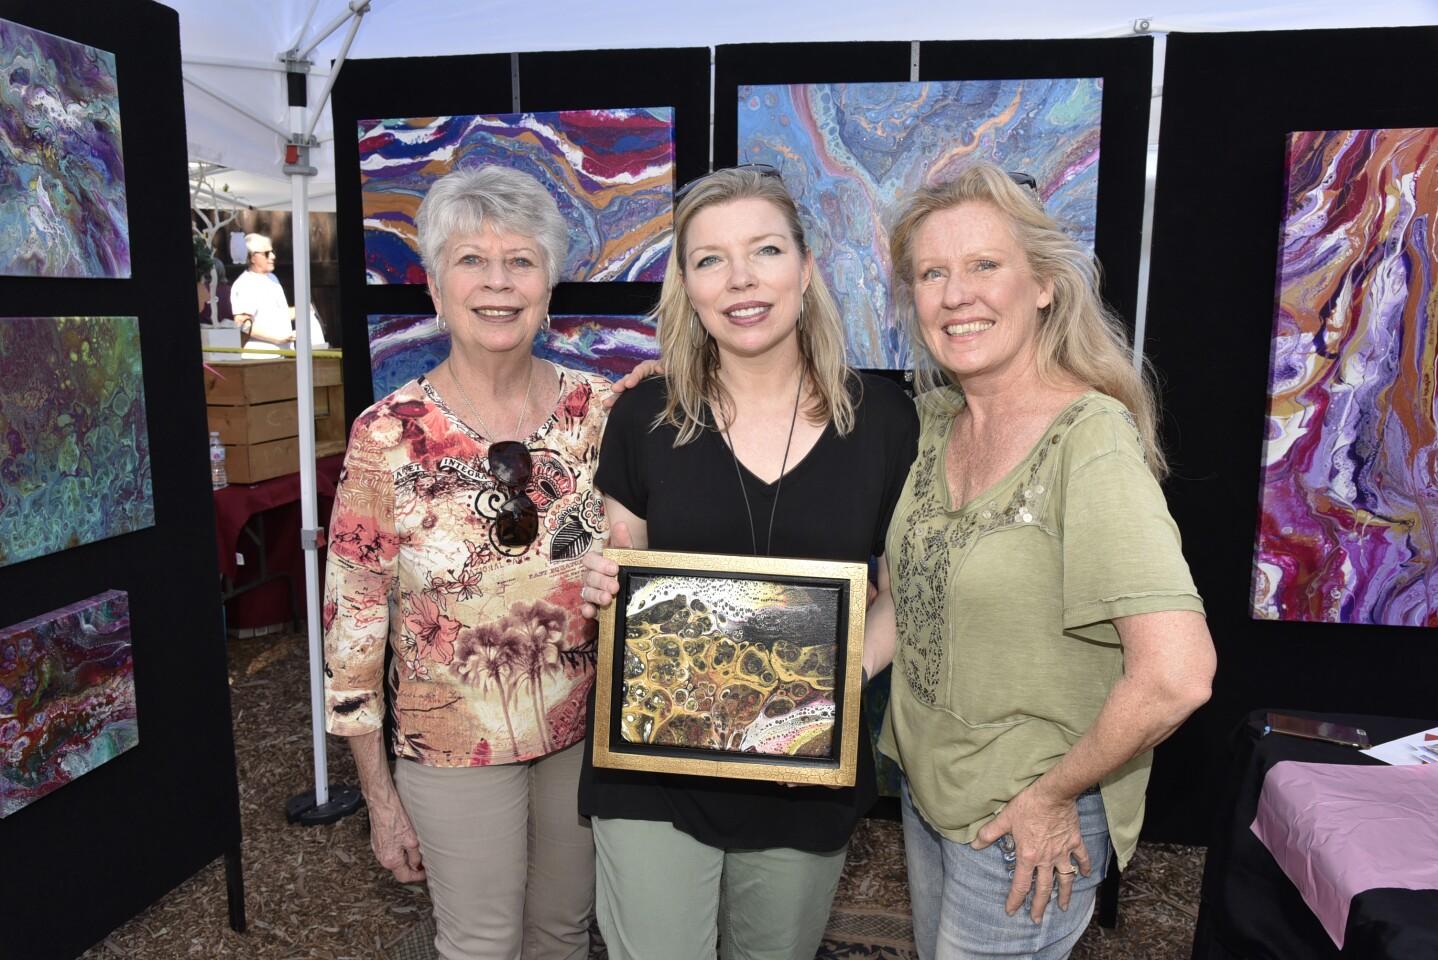 Ruth Hoffman, Valerie Barnes with her new art, artist Marsha Bakko (www.MarshaBakko.com)